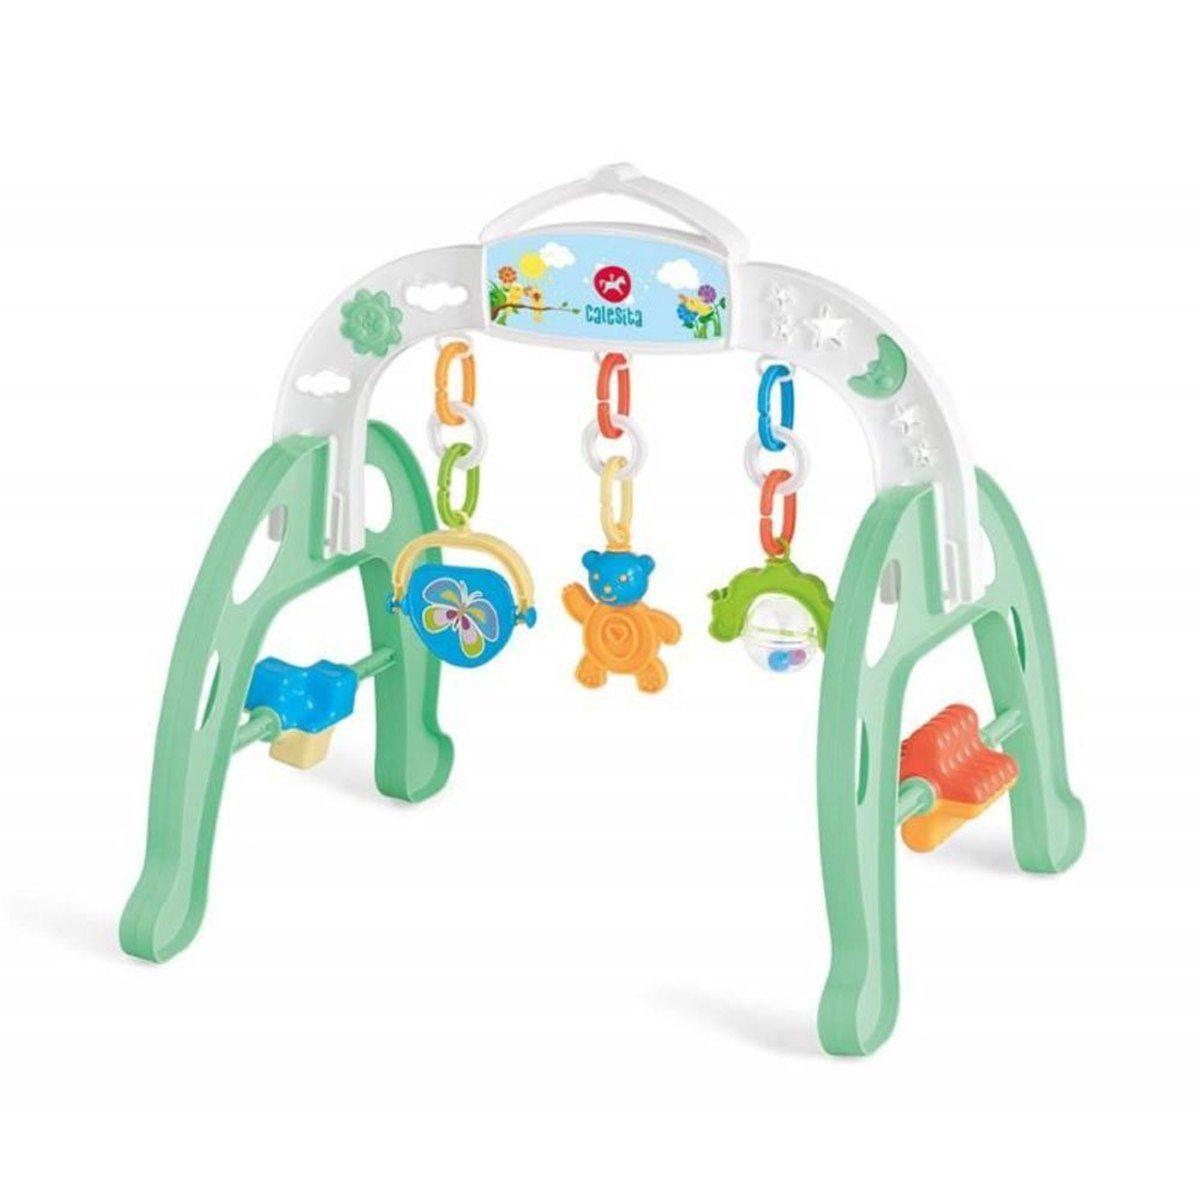 Centro De Atividades Baby Gym Calesita Verde - 901